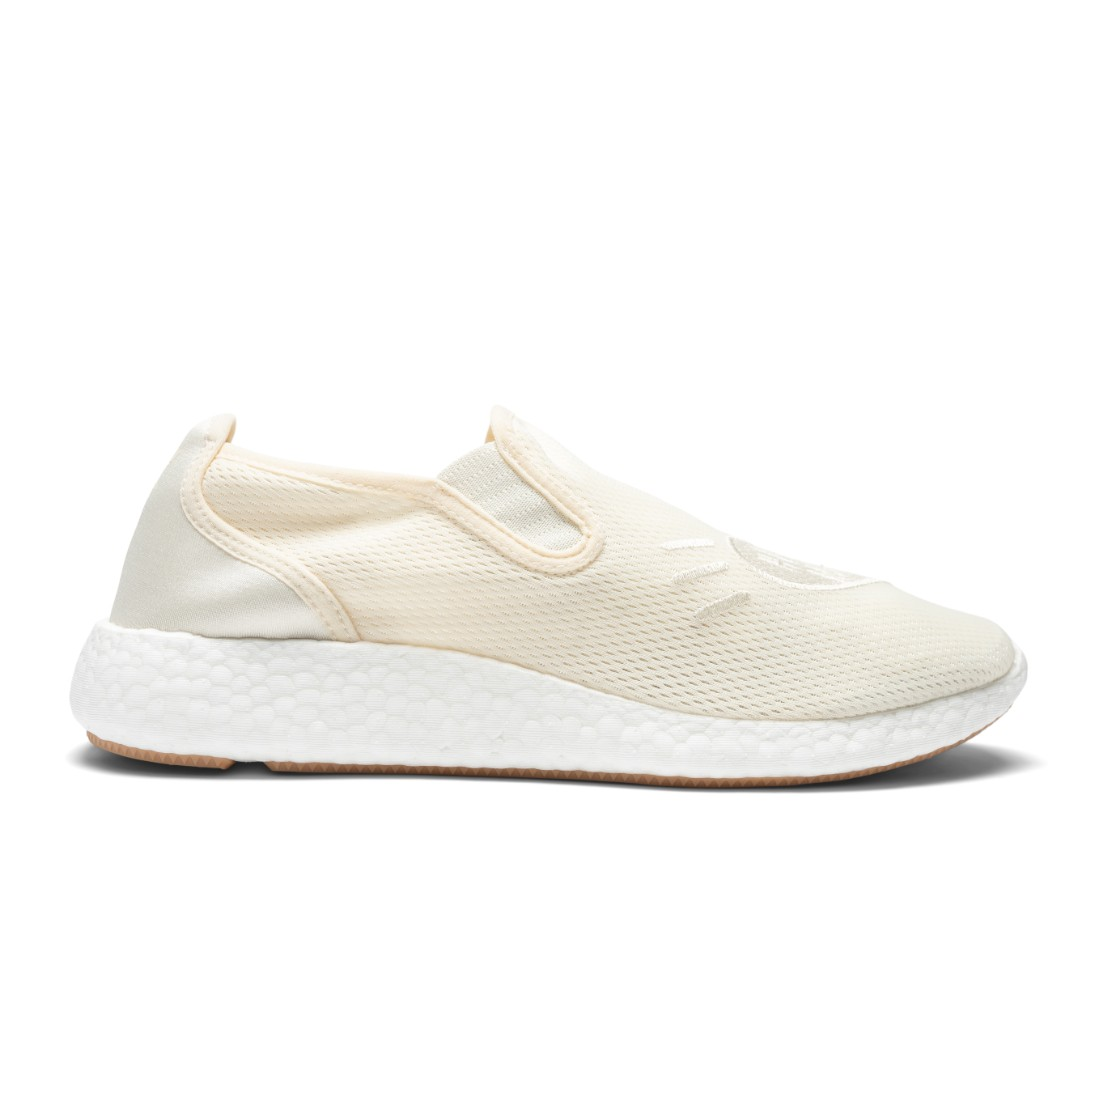 Adidas x Human Made Men Slipon Pure (white / footwear white / core black)